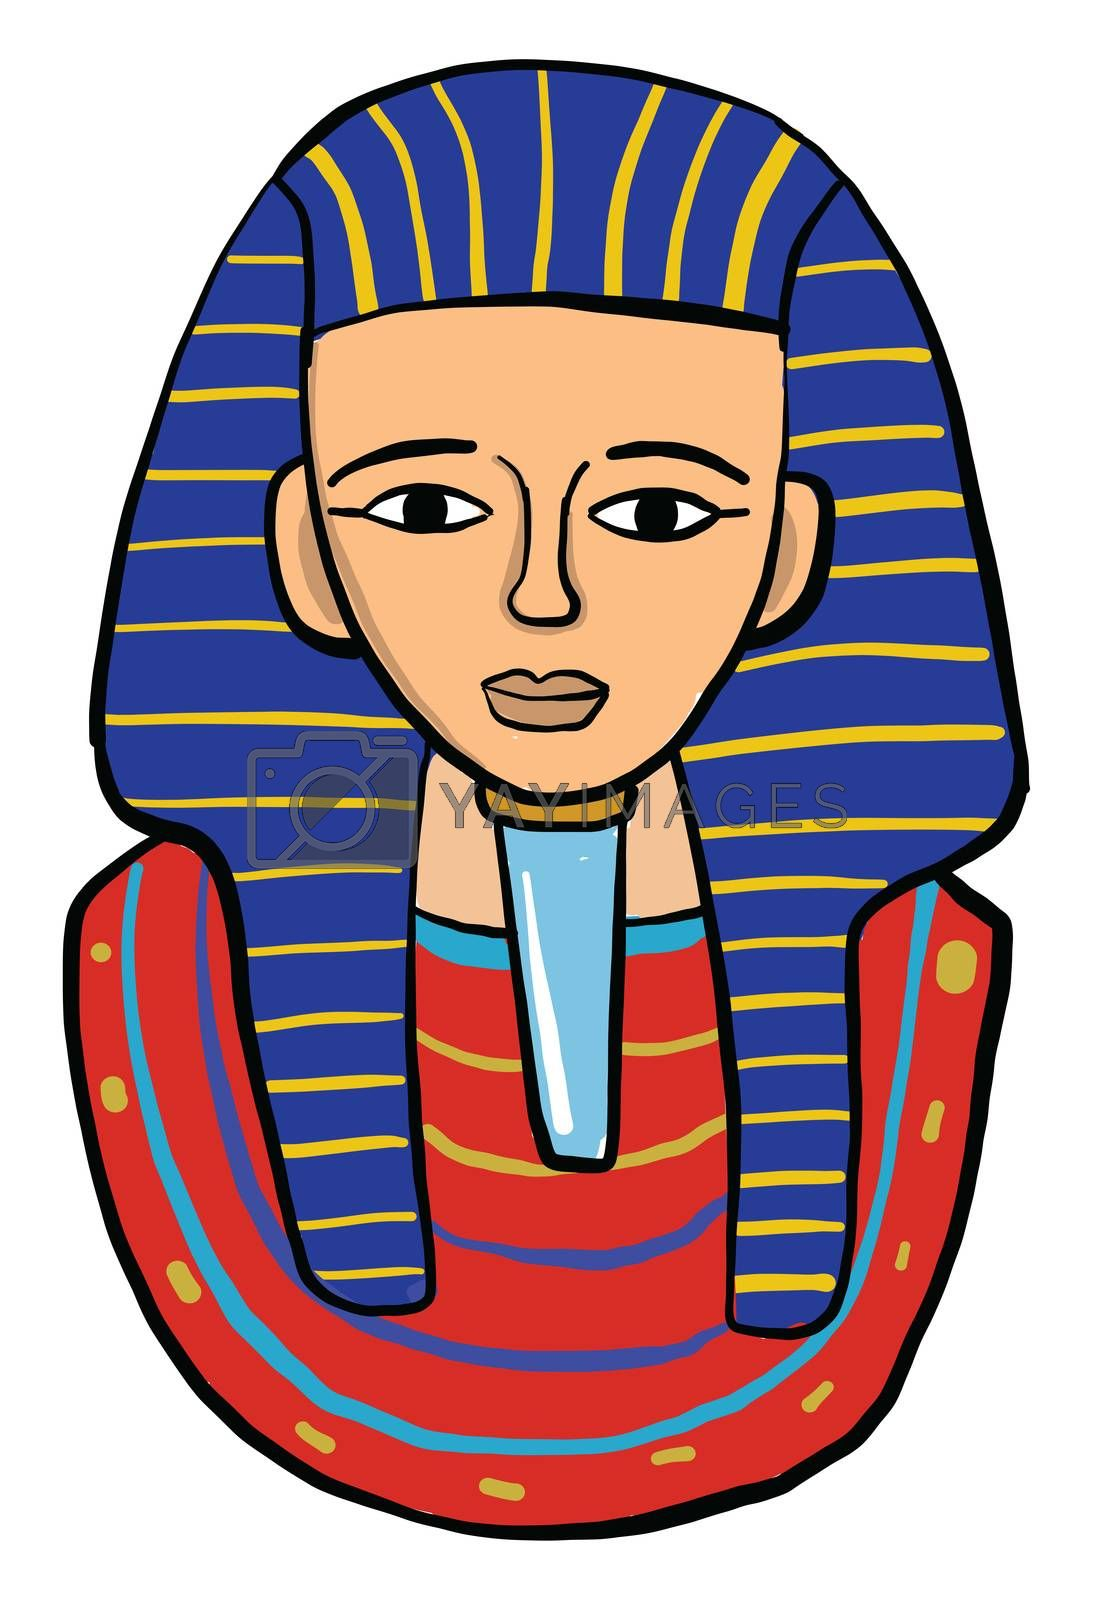 Tutankhamun , illustration, vector on white background